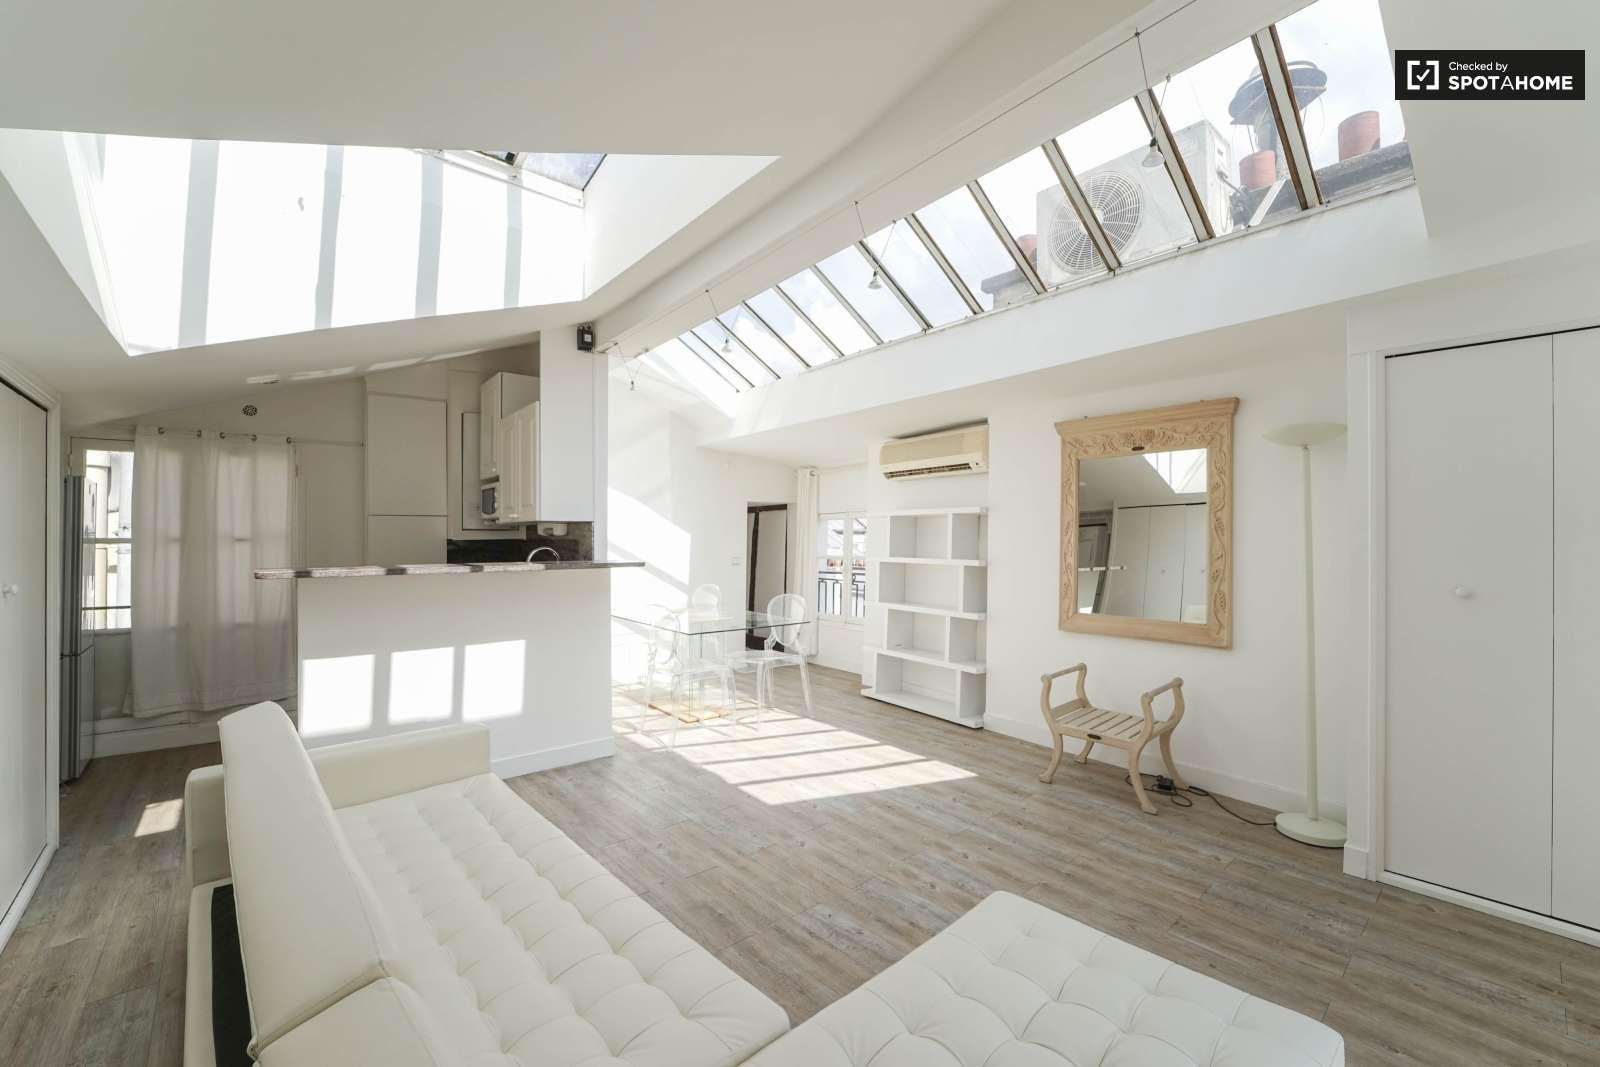 beautiful 1 bedroom apartment for rent in paris spotahome